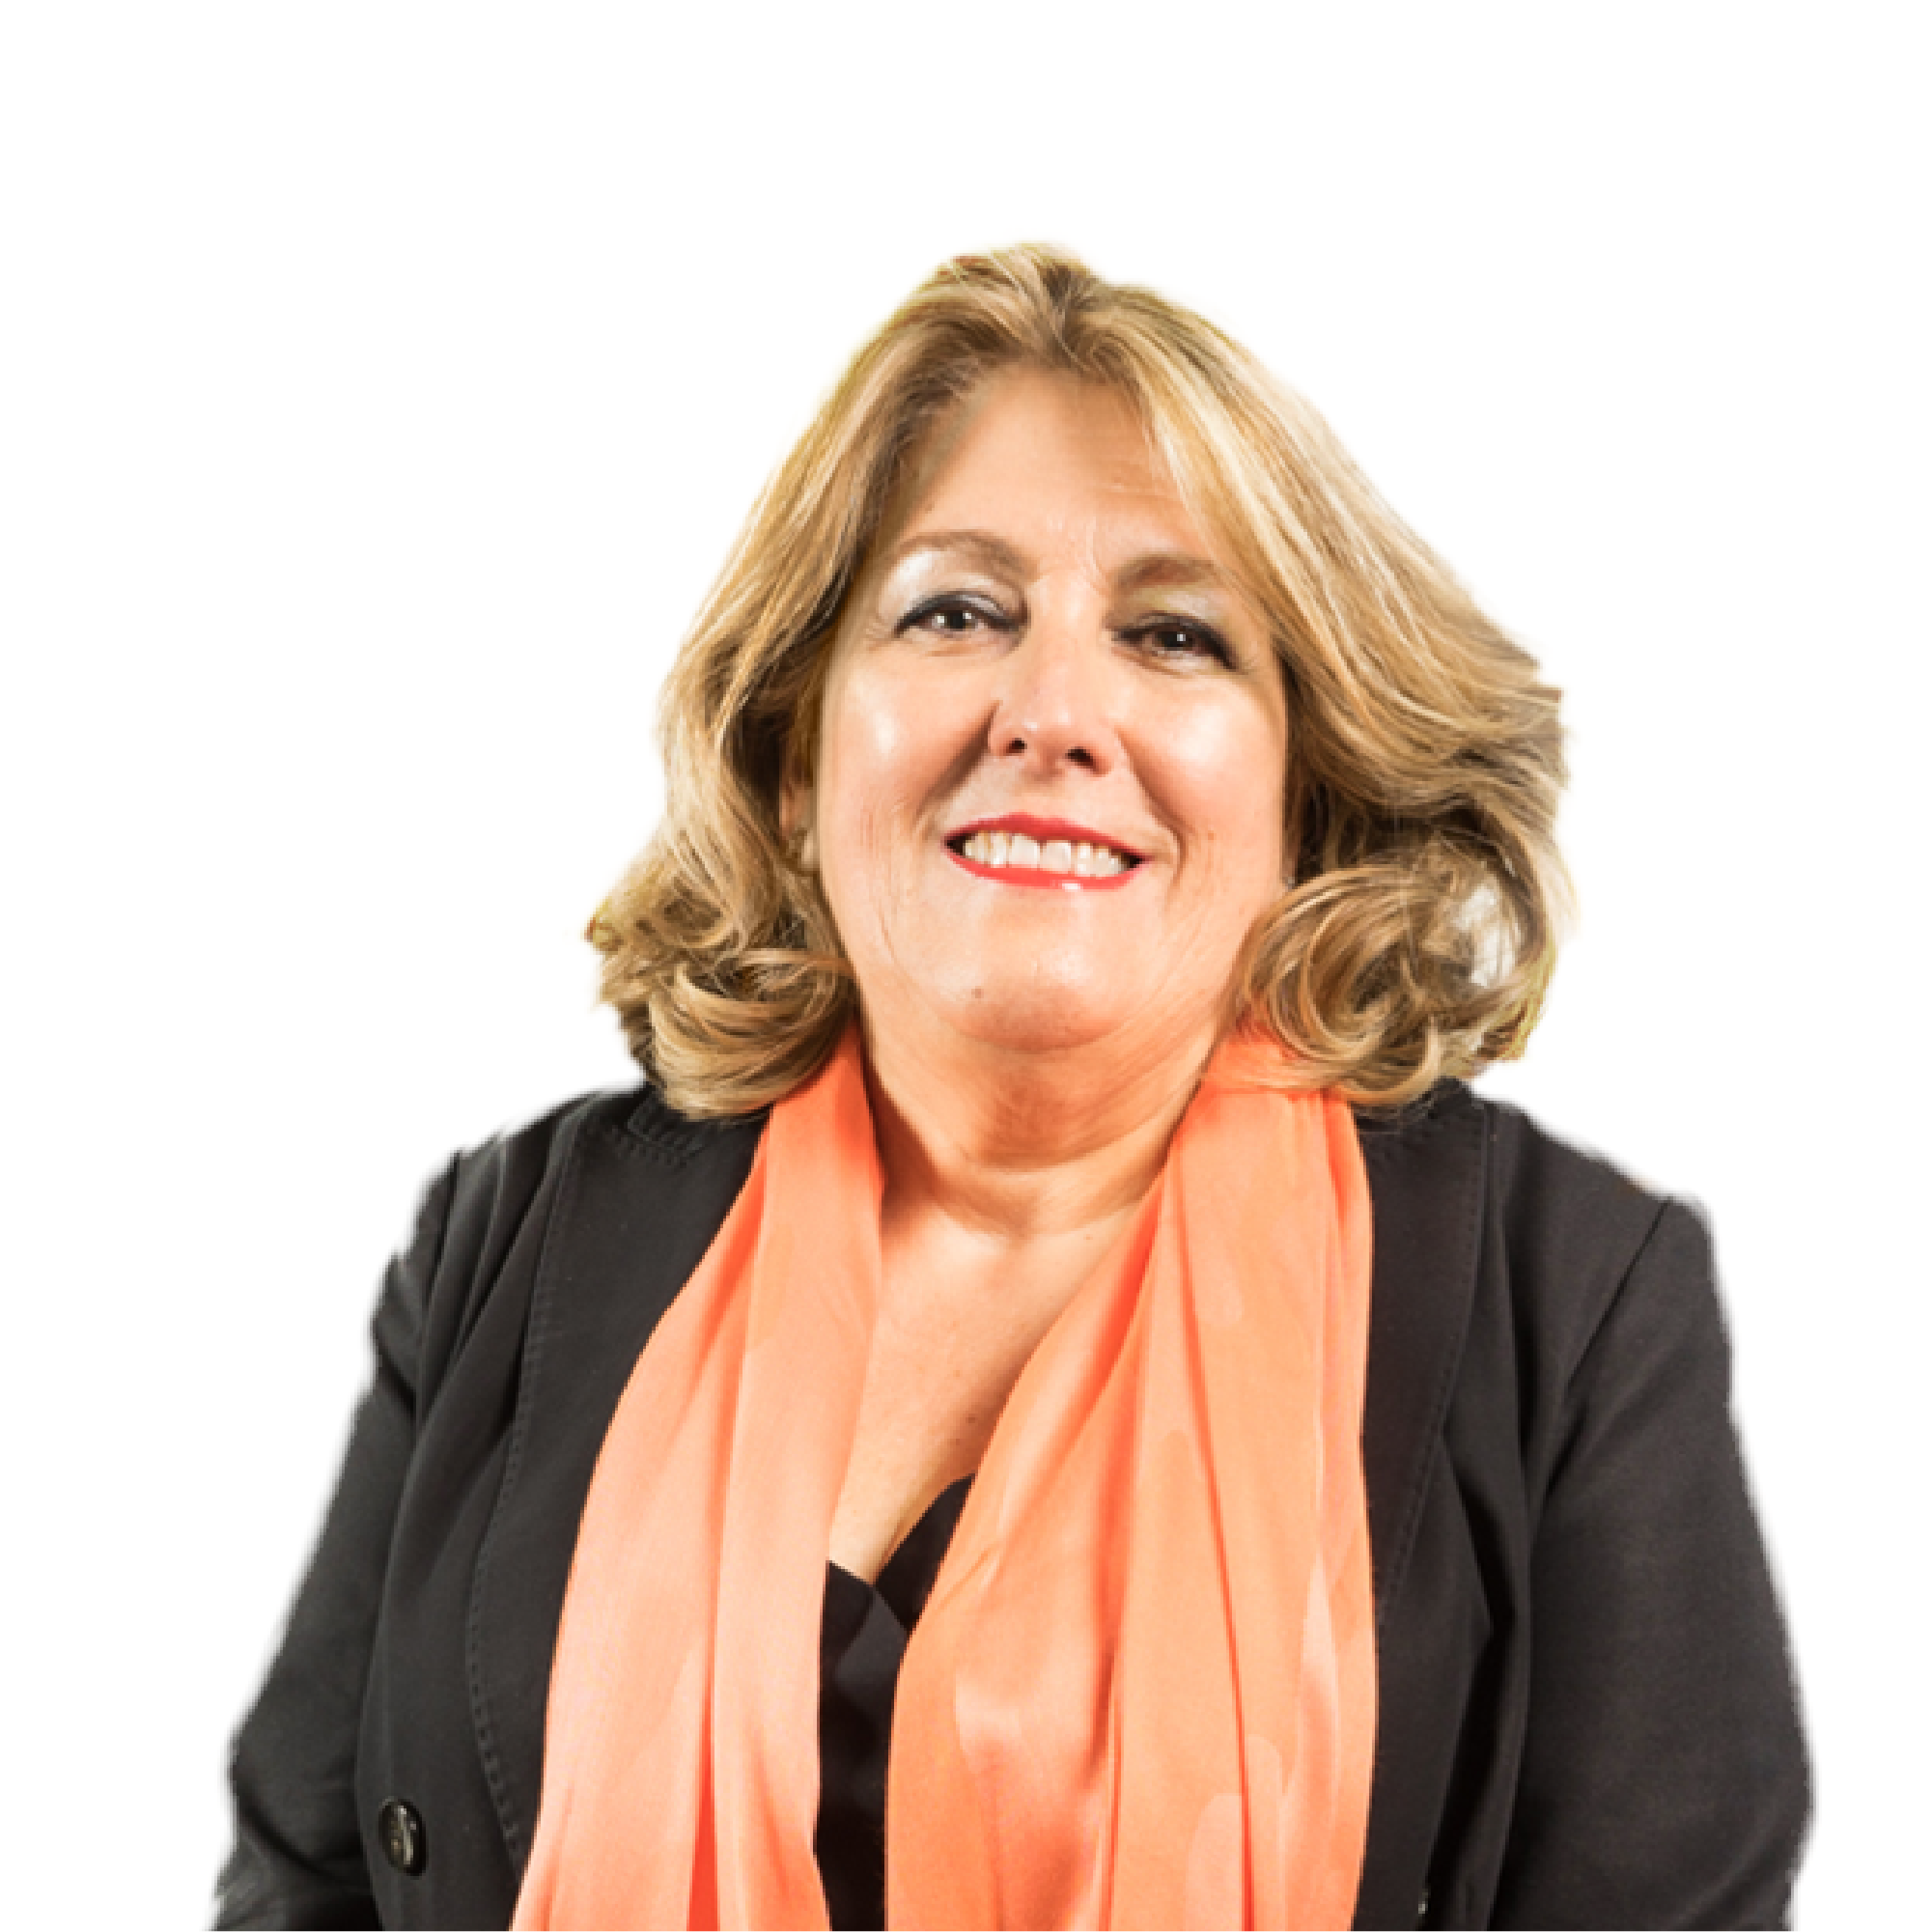 Lisa Méndez Moreno